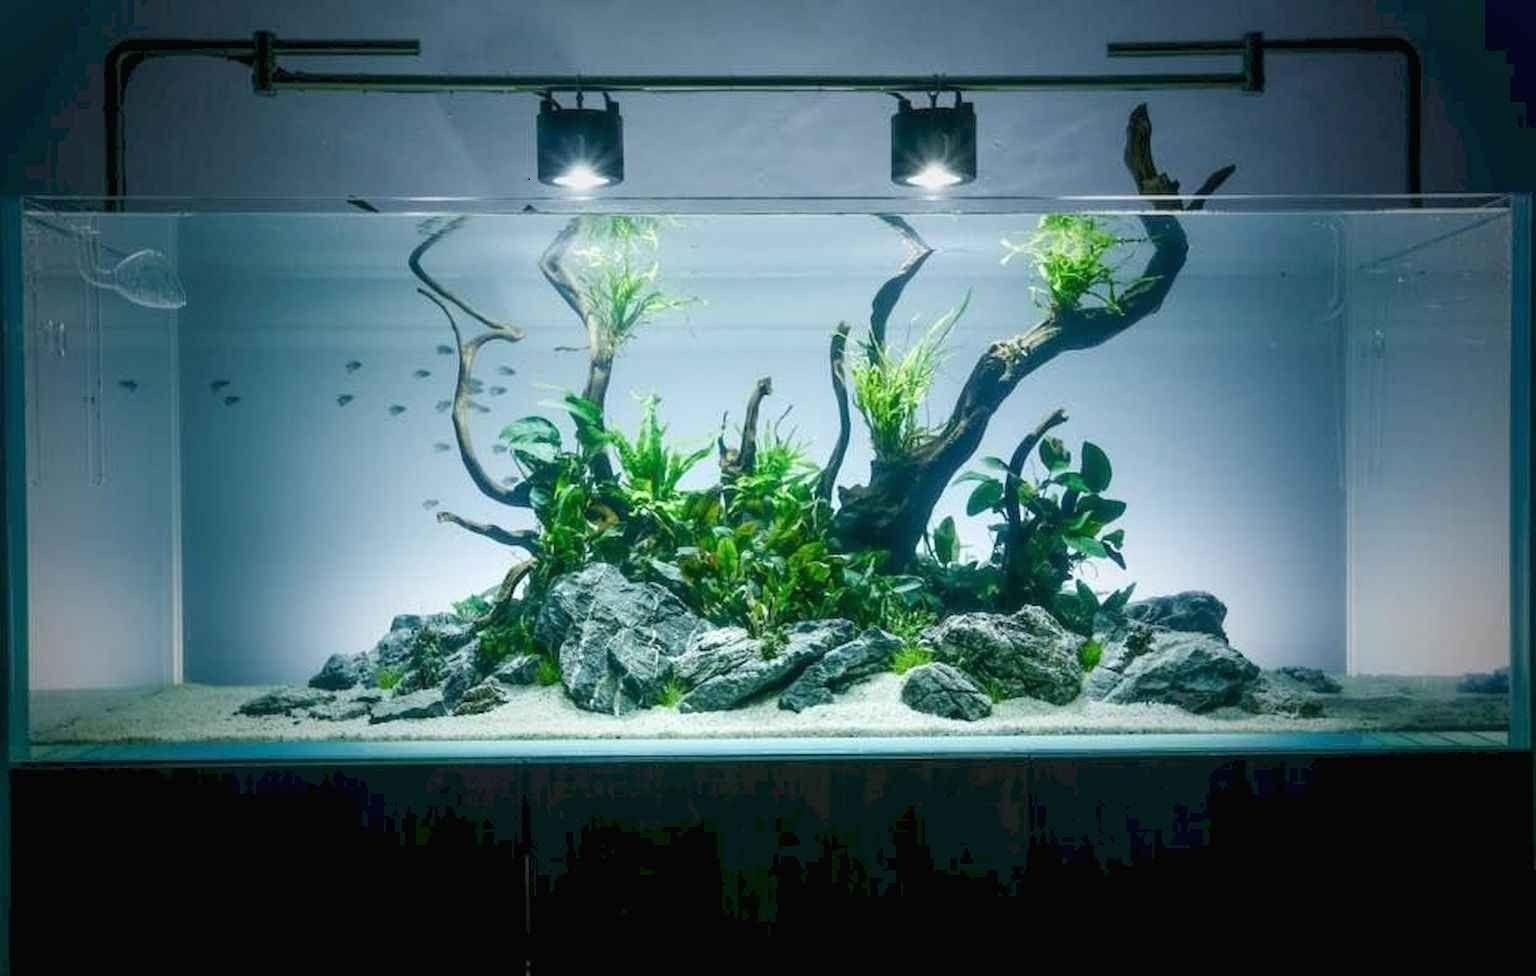 Relaxation Aquascaping Ideas For Inspiration In 2020 Aquascape Design Fish Aquarium Decorations Aquascape Aquarium